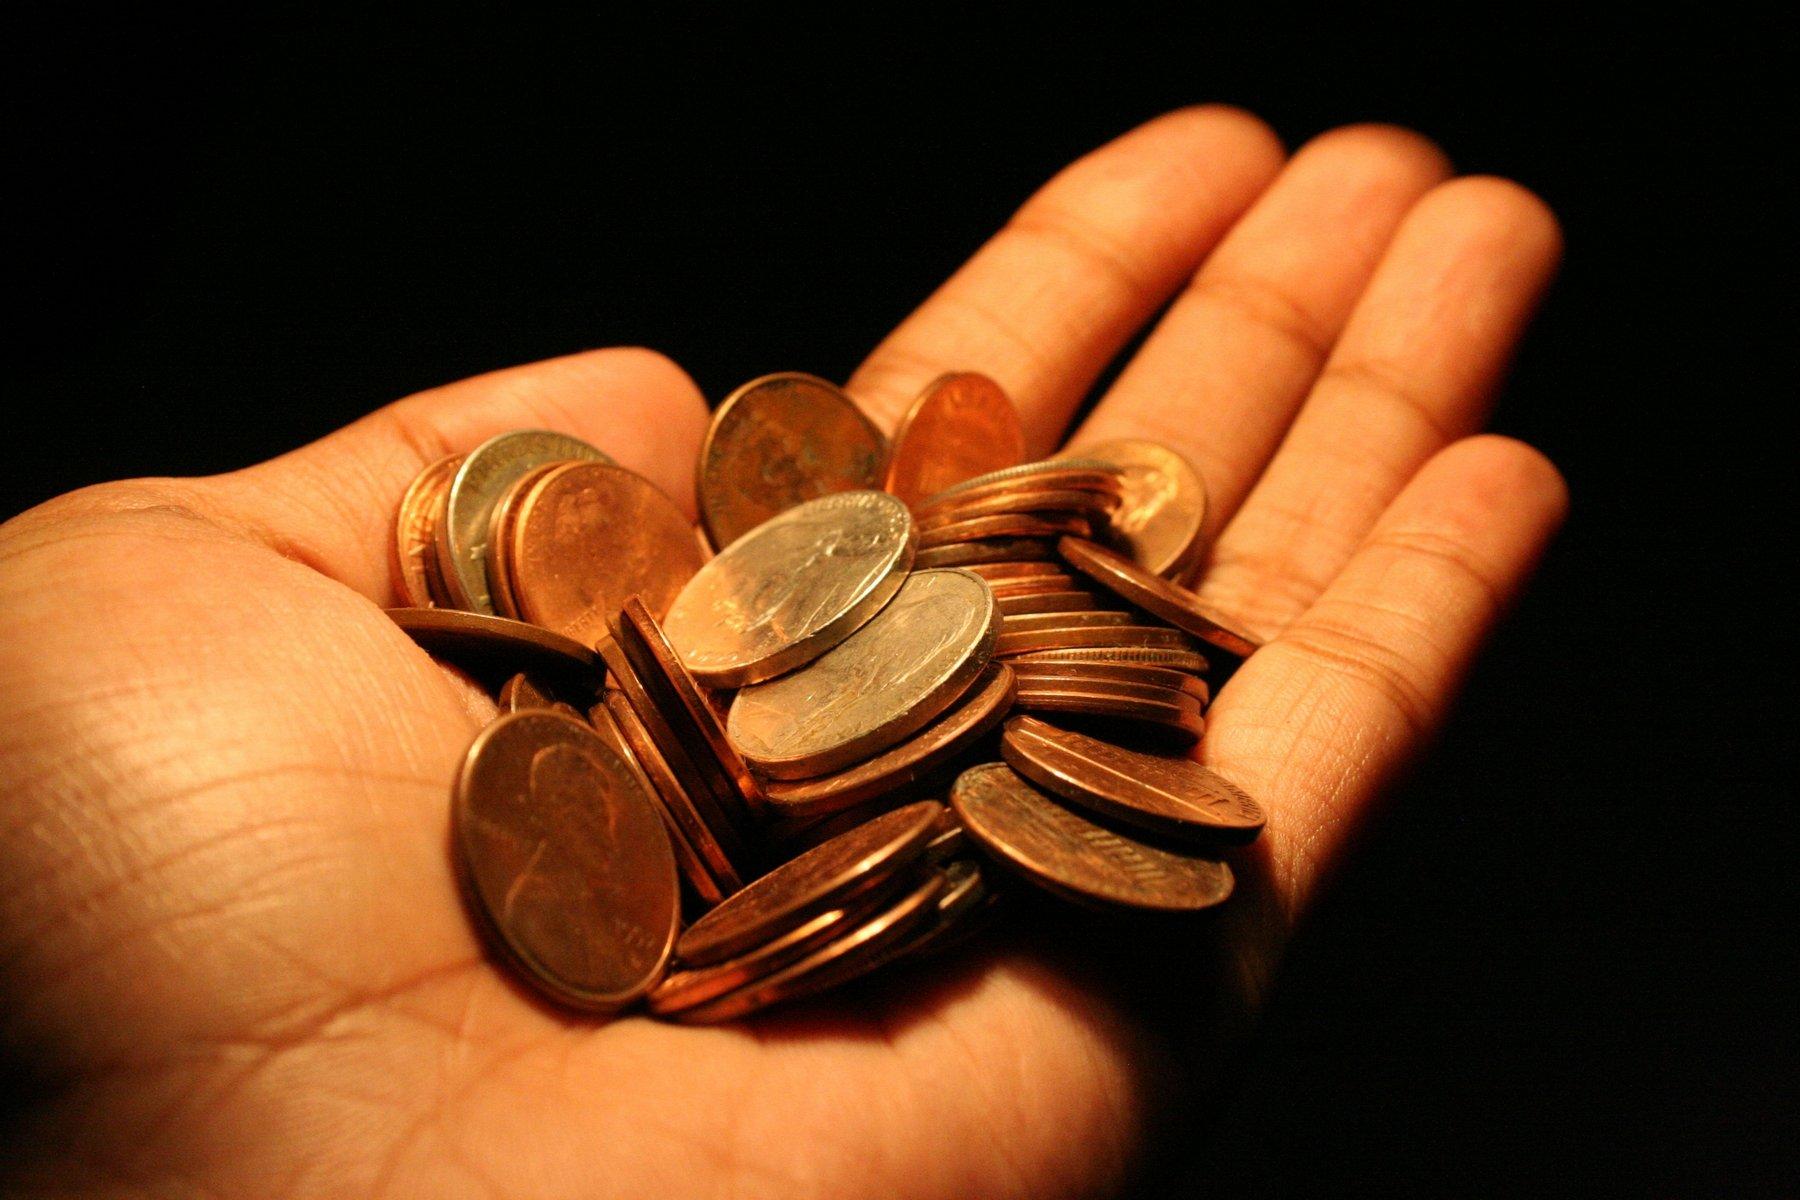 Money - The escape of Poverty